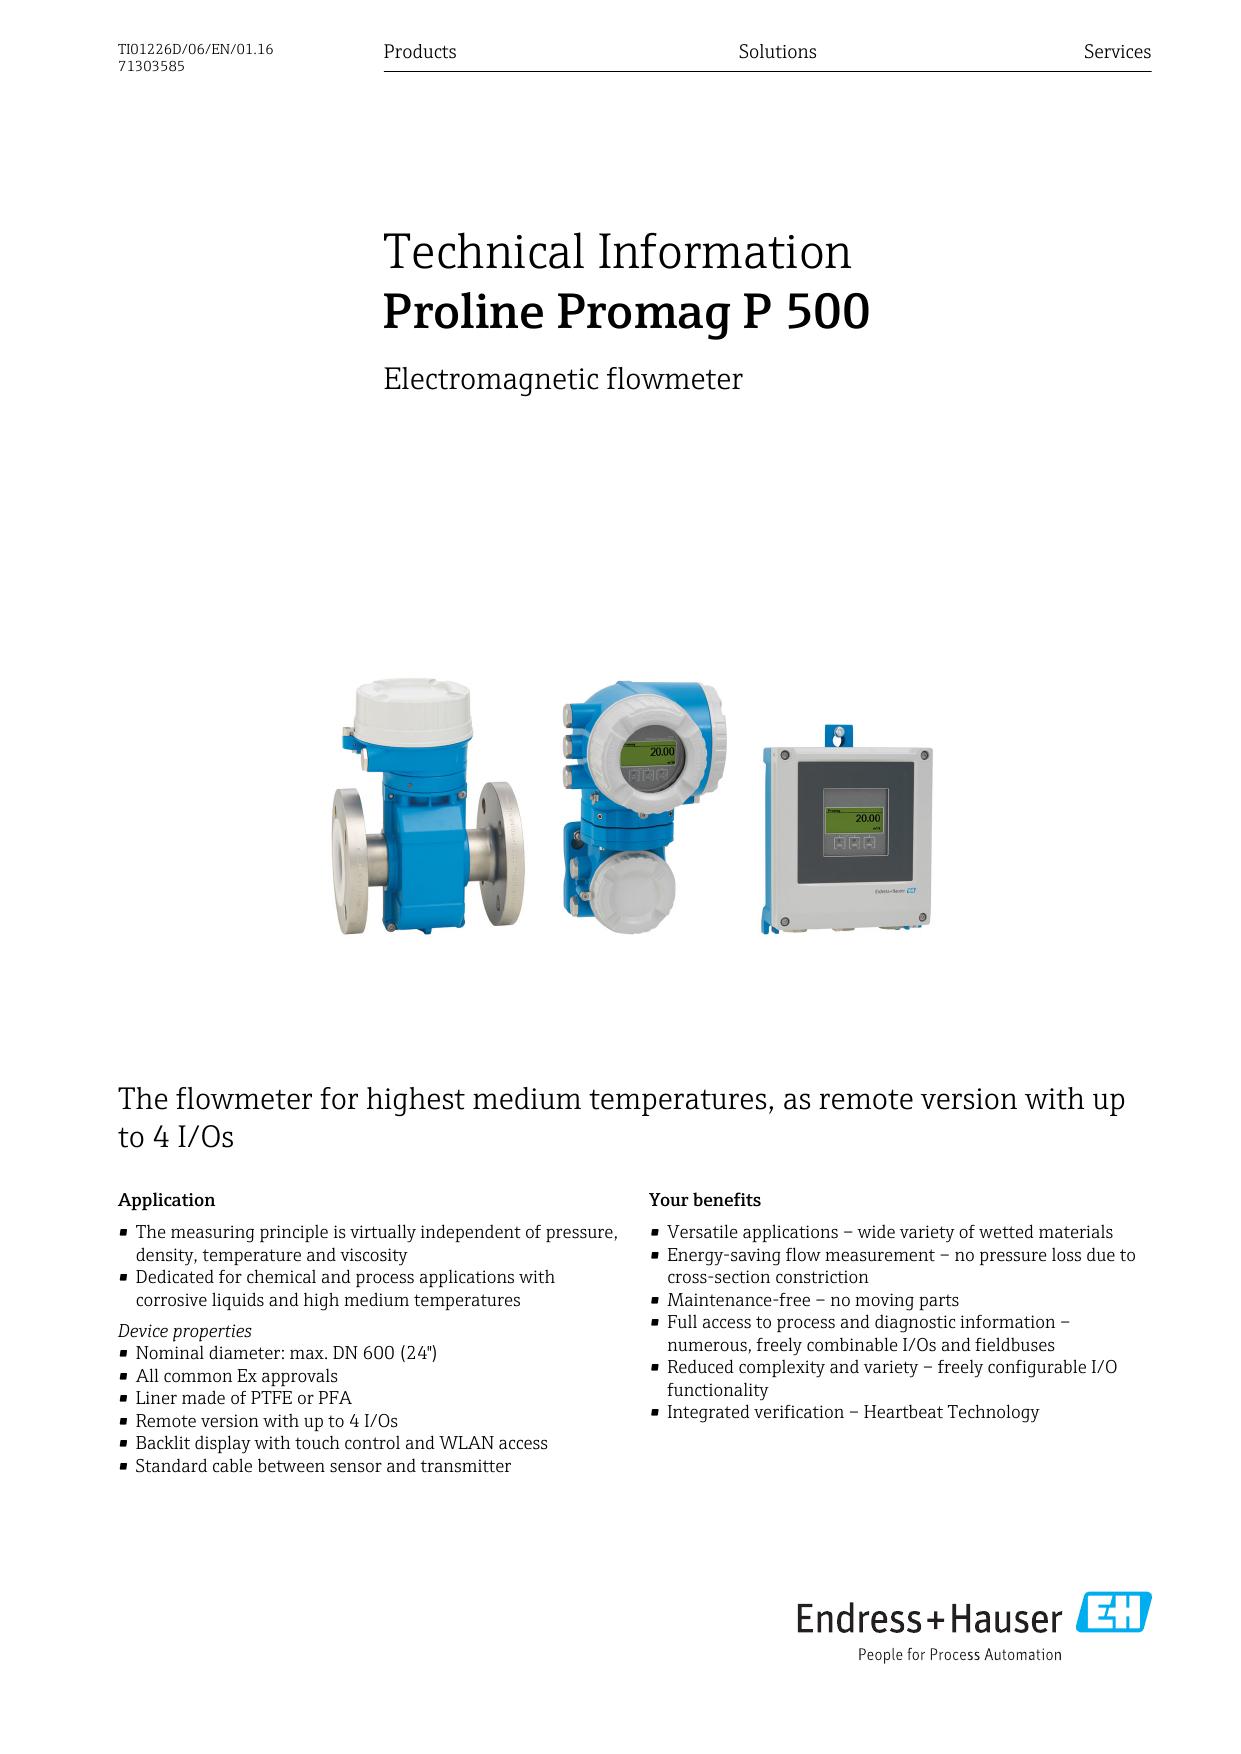 Proline Promag P 500 - Endress+Hauser Portal | manualzz com